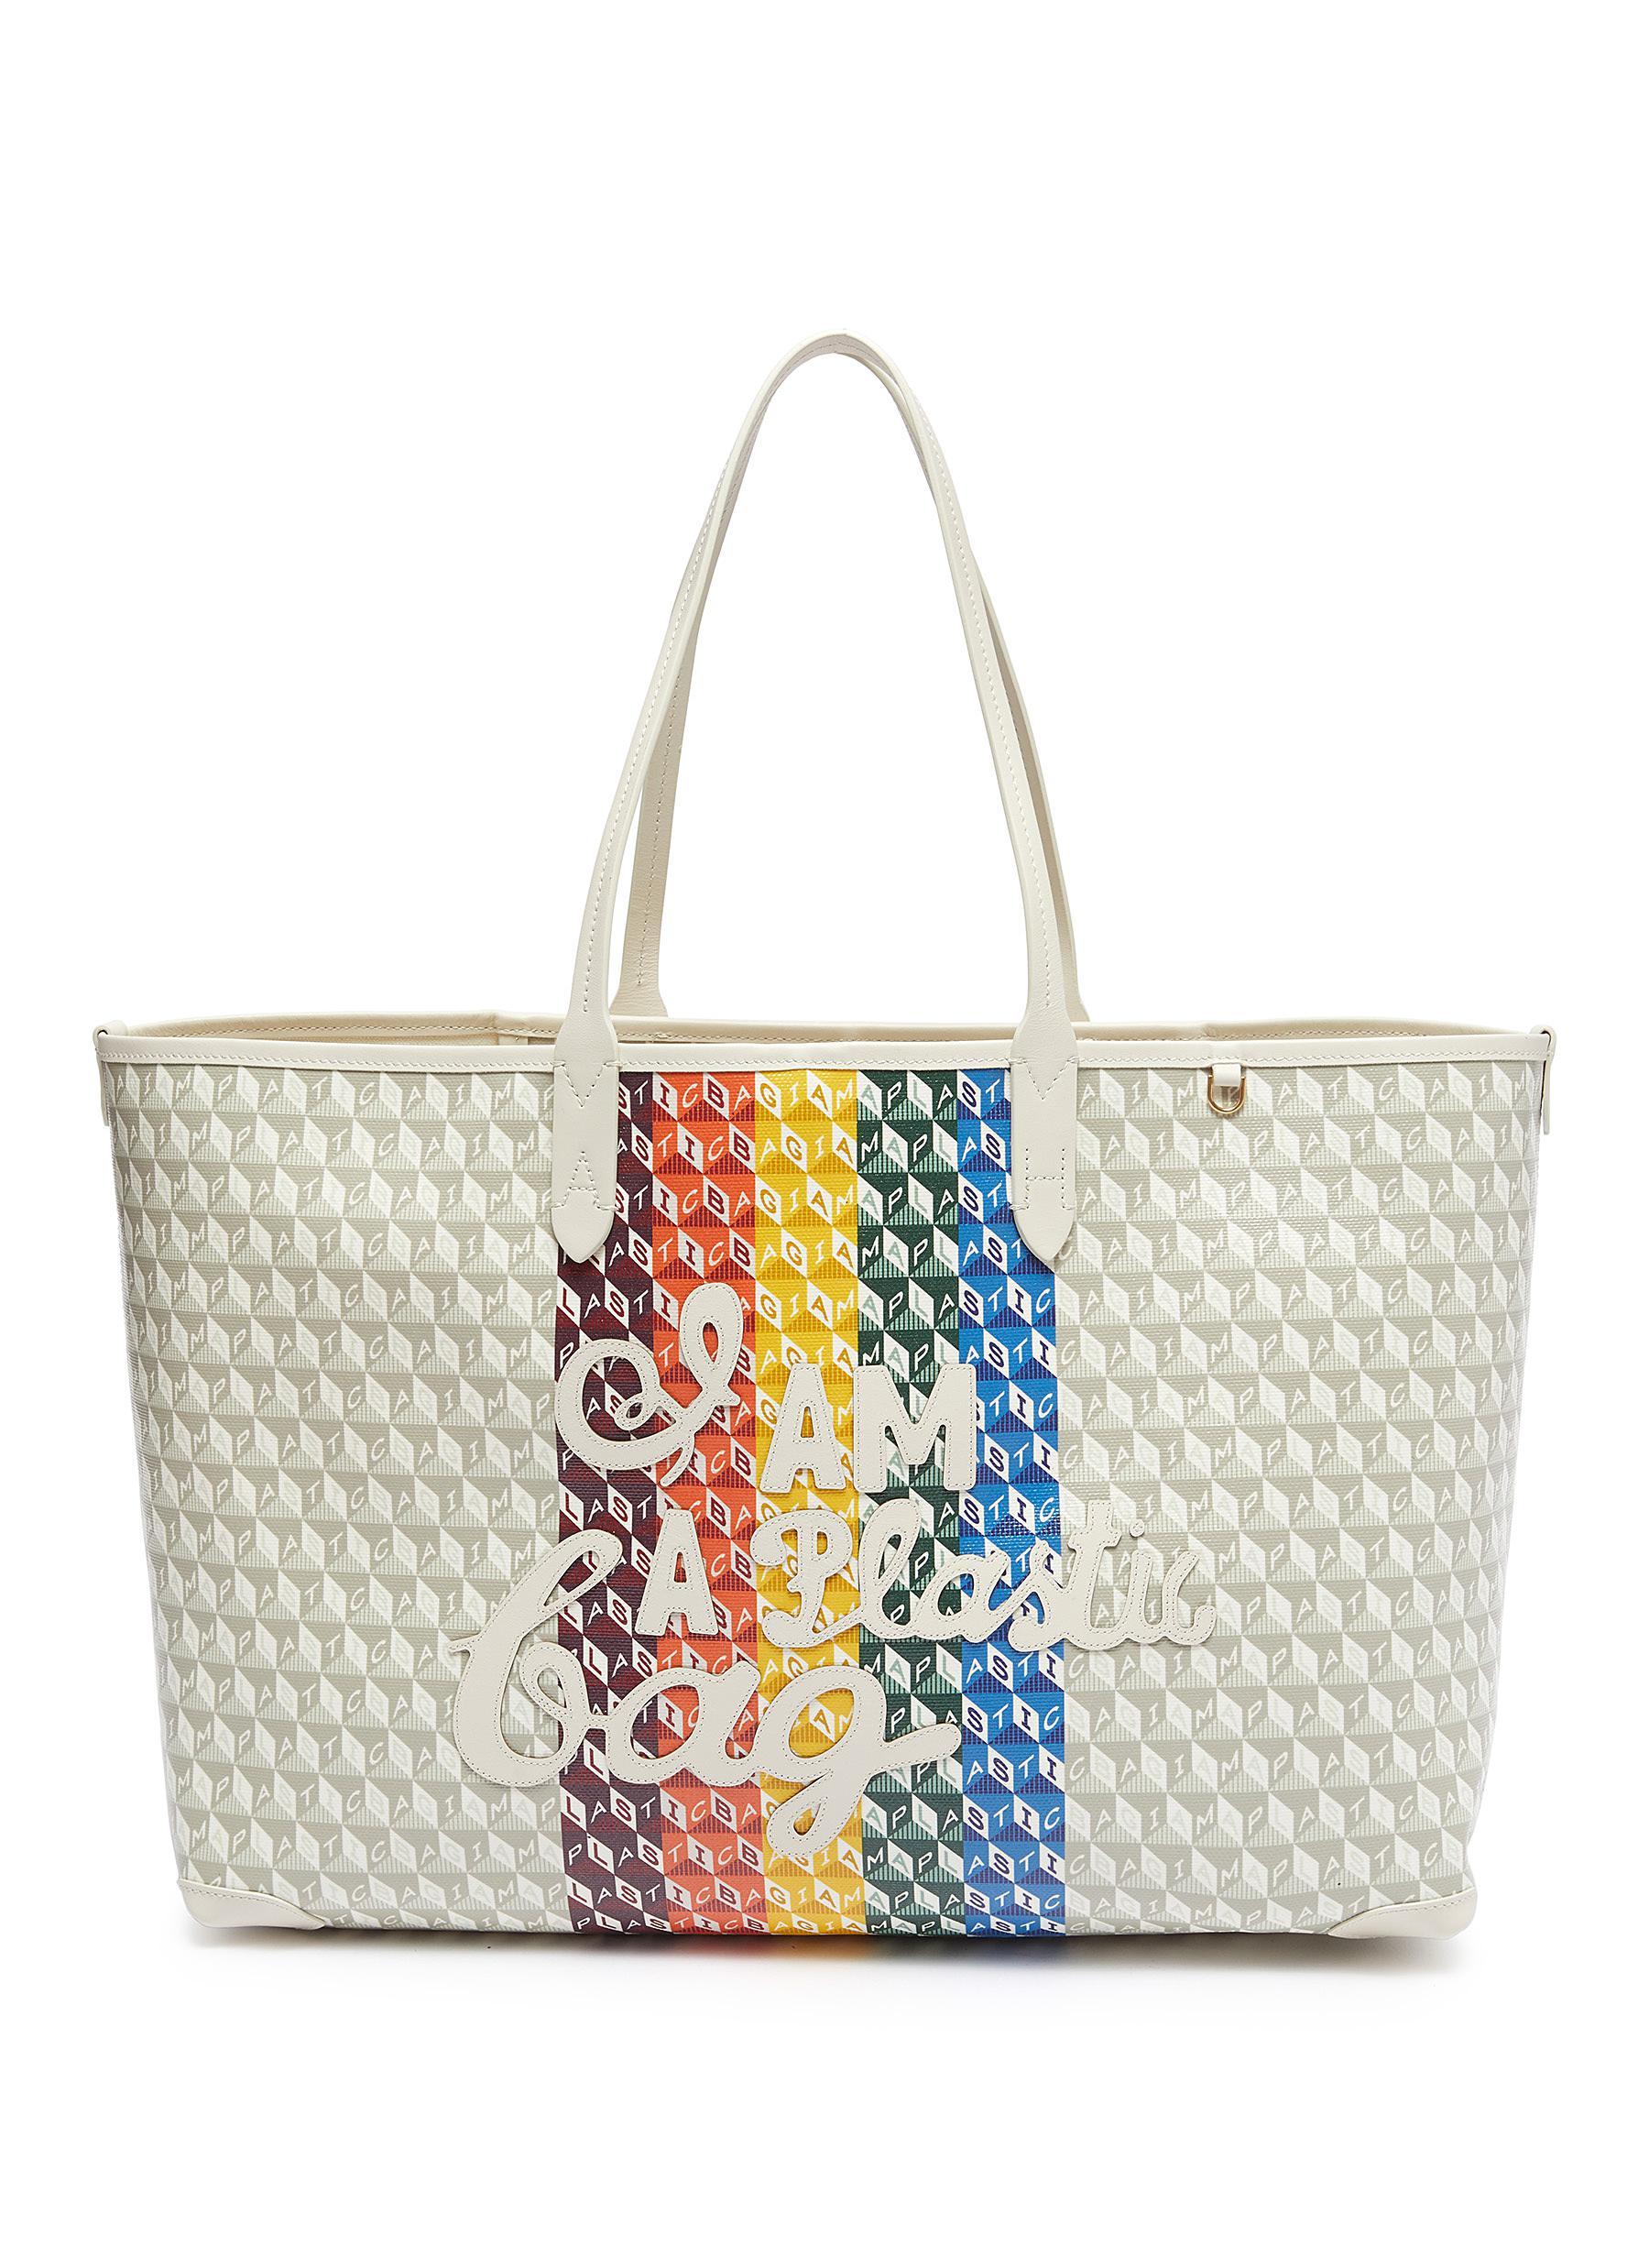 I Am A Plastic Bag' Rainbow Motif Tote - ANYA HINDMARCH - Modalova